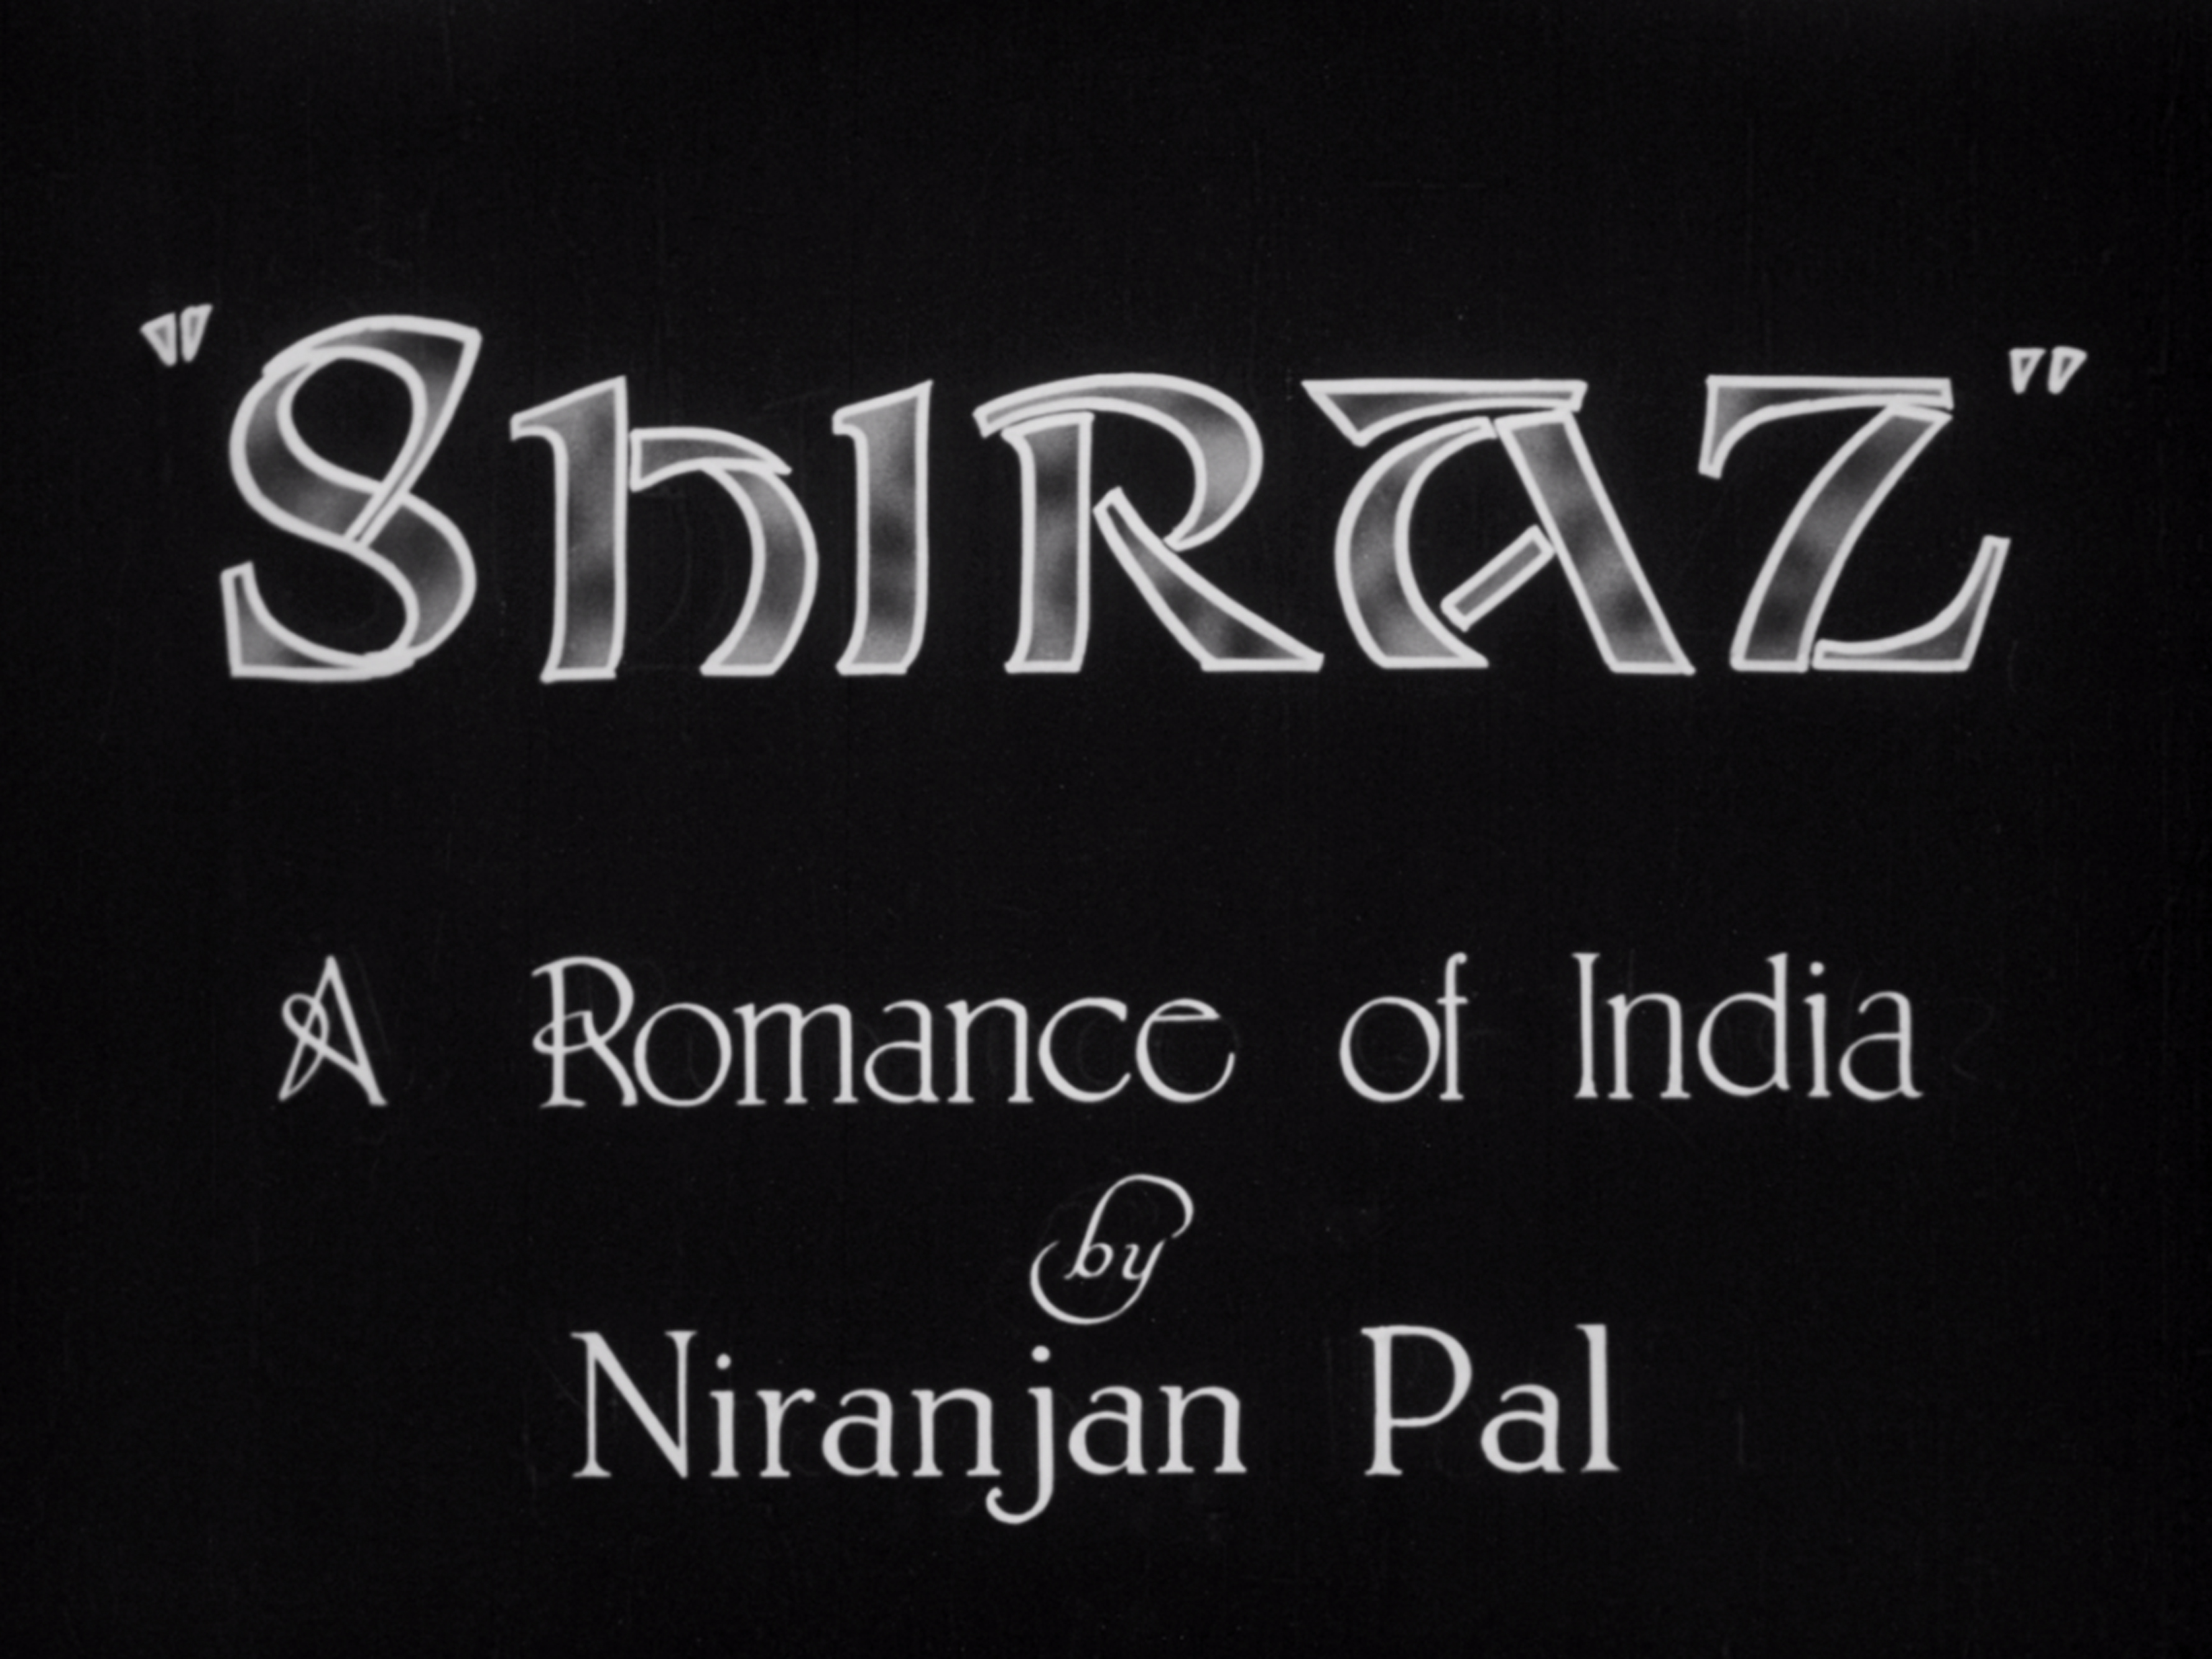 Shiraz: A Romance of India (1928, BFI National Archive)